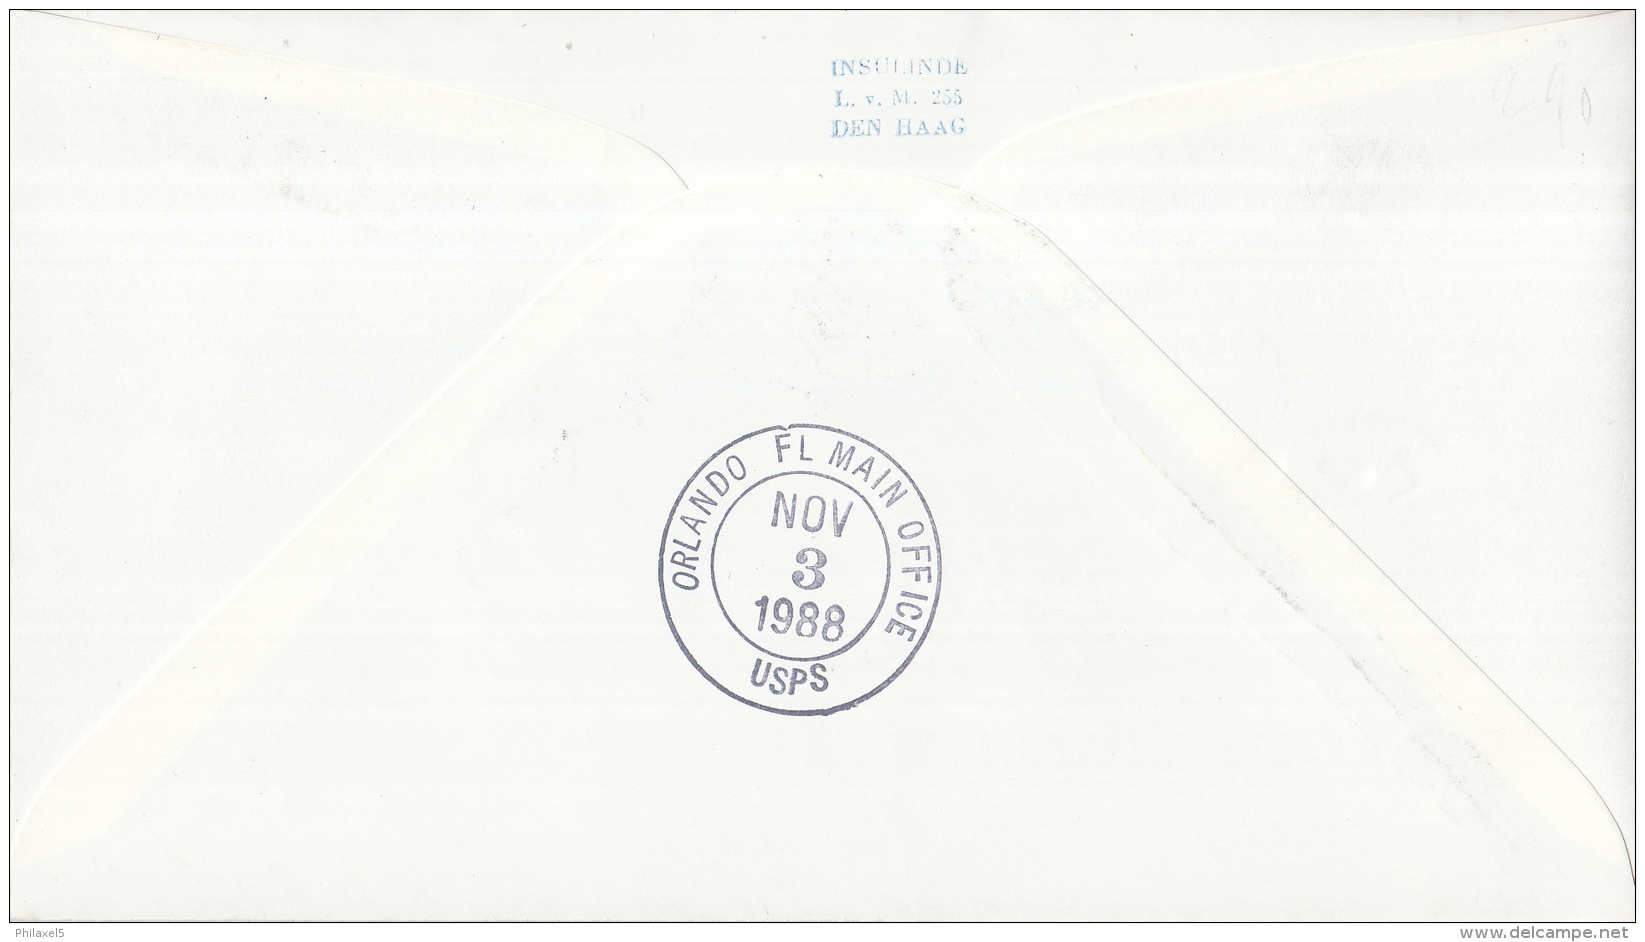 Nederland - 1ste Vlucht - 3 November 1988 - Amsterdam-Orlando, Florida - Vl. Hol. 1096a - Marcofilie - EMA (Print Machine)